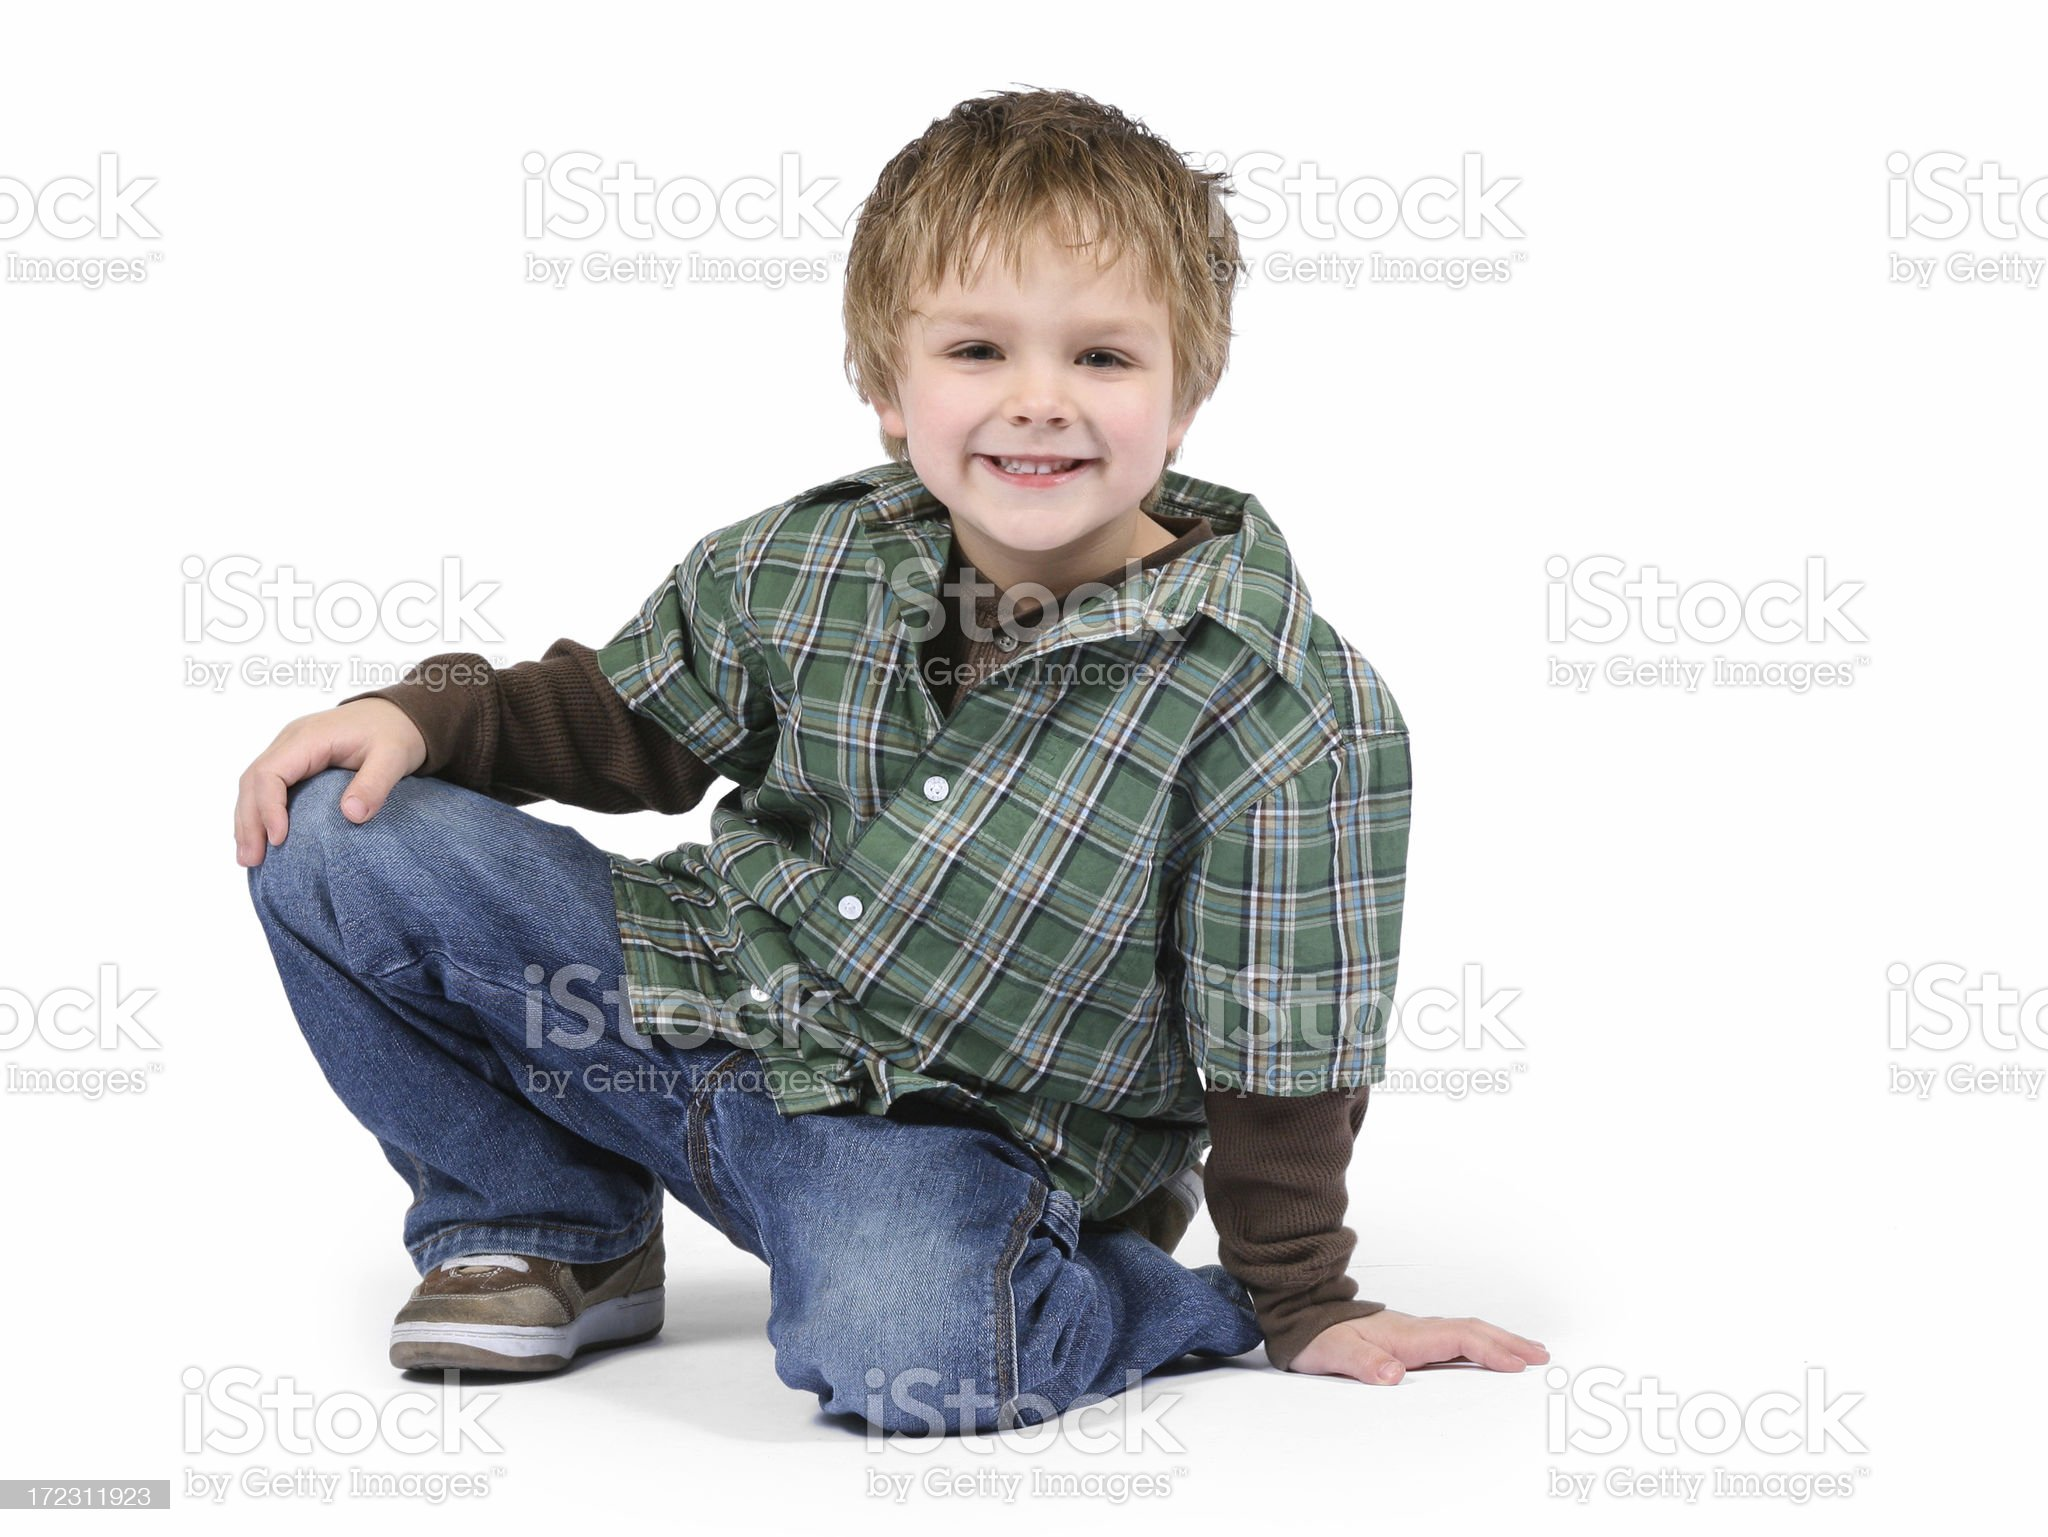 Boy Crouching Down Smiling At The Camera royalty-free stock photo